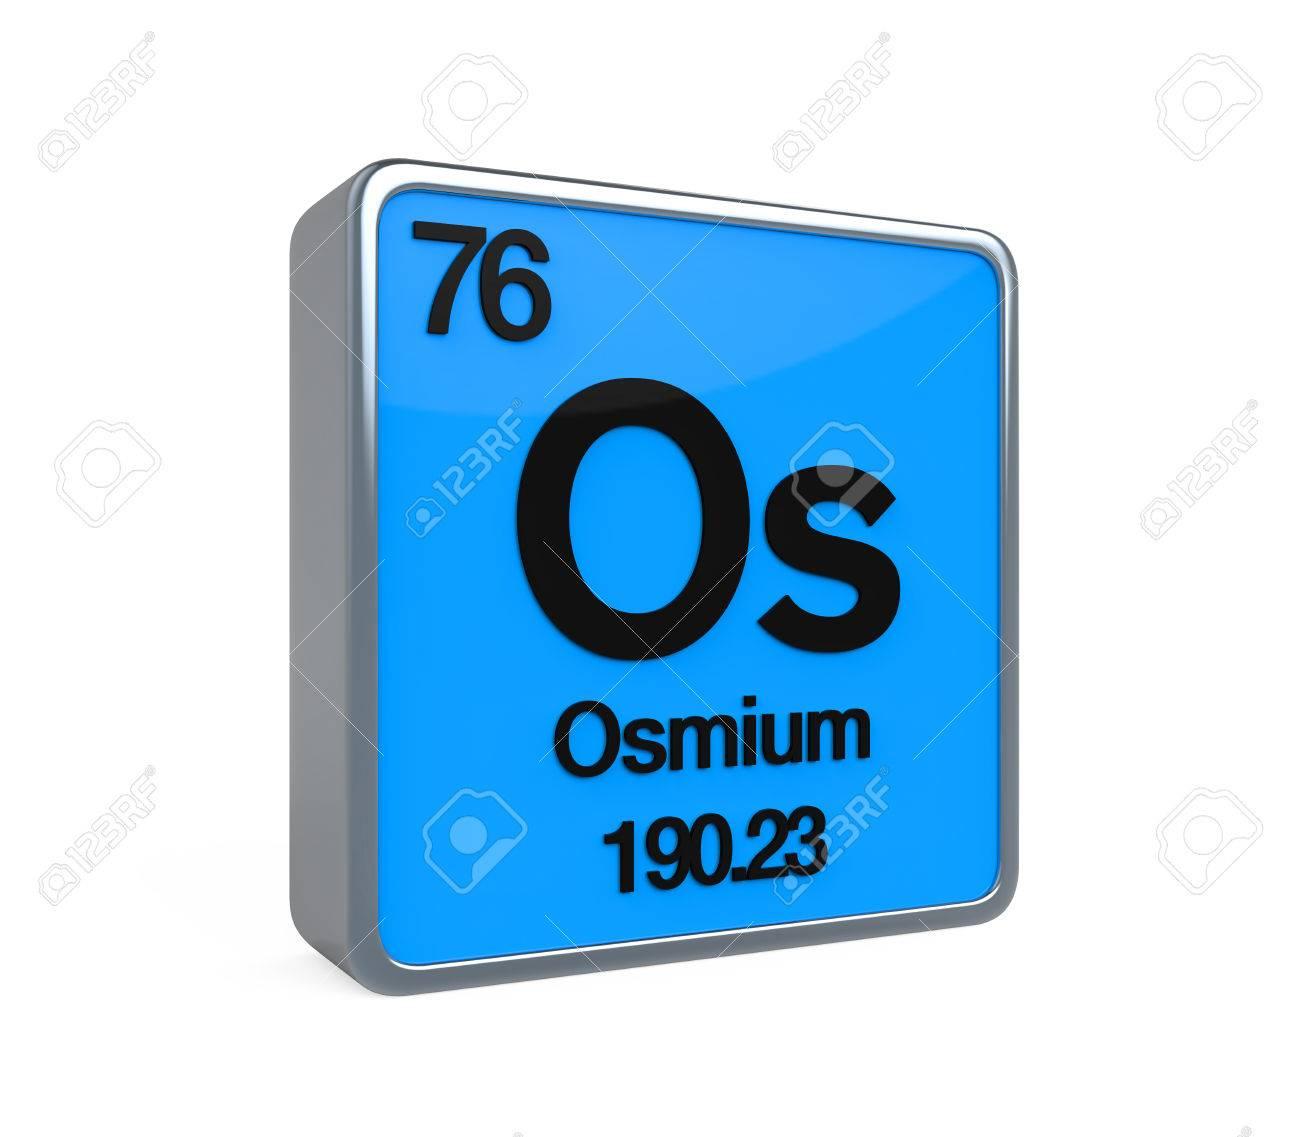 Osmium element periodic table stock photo picture and royalty osmium element periodic table stock photo 32898027 urtaz Images